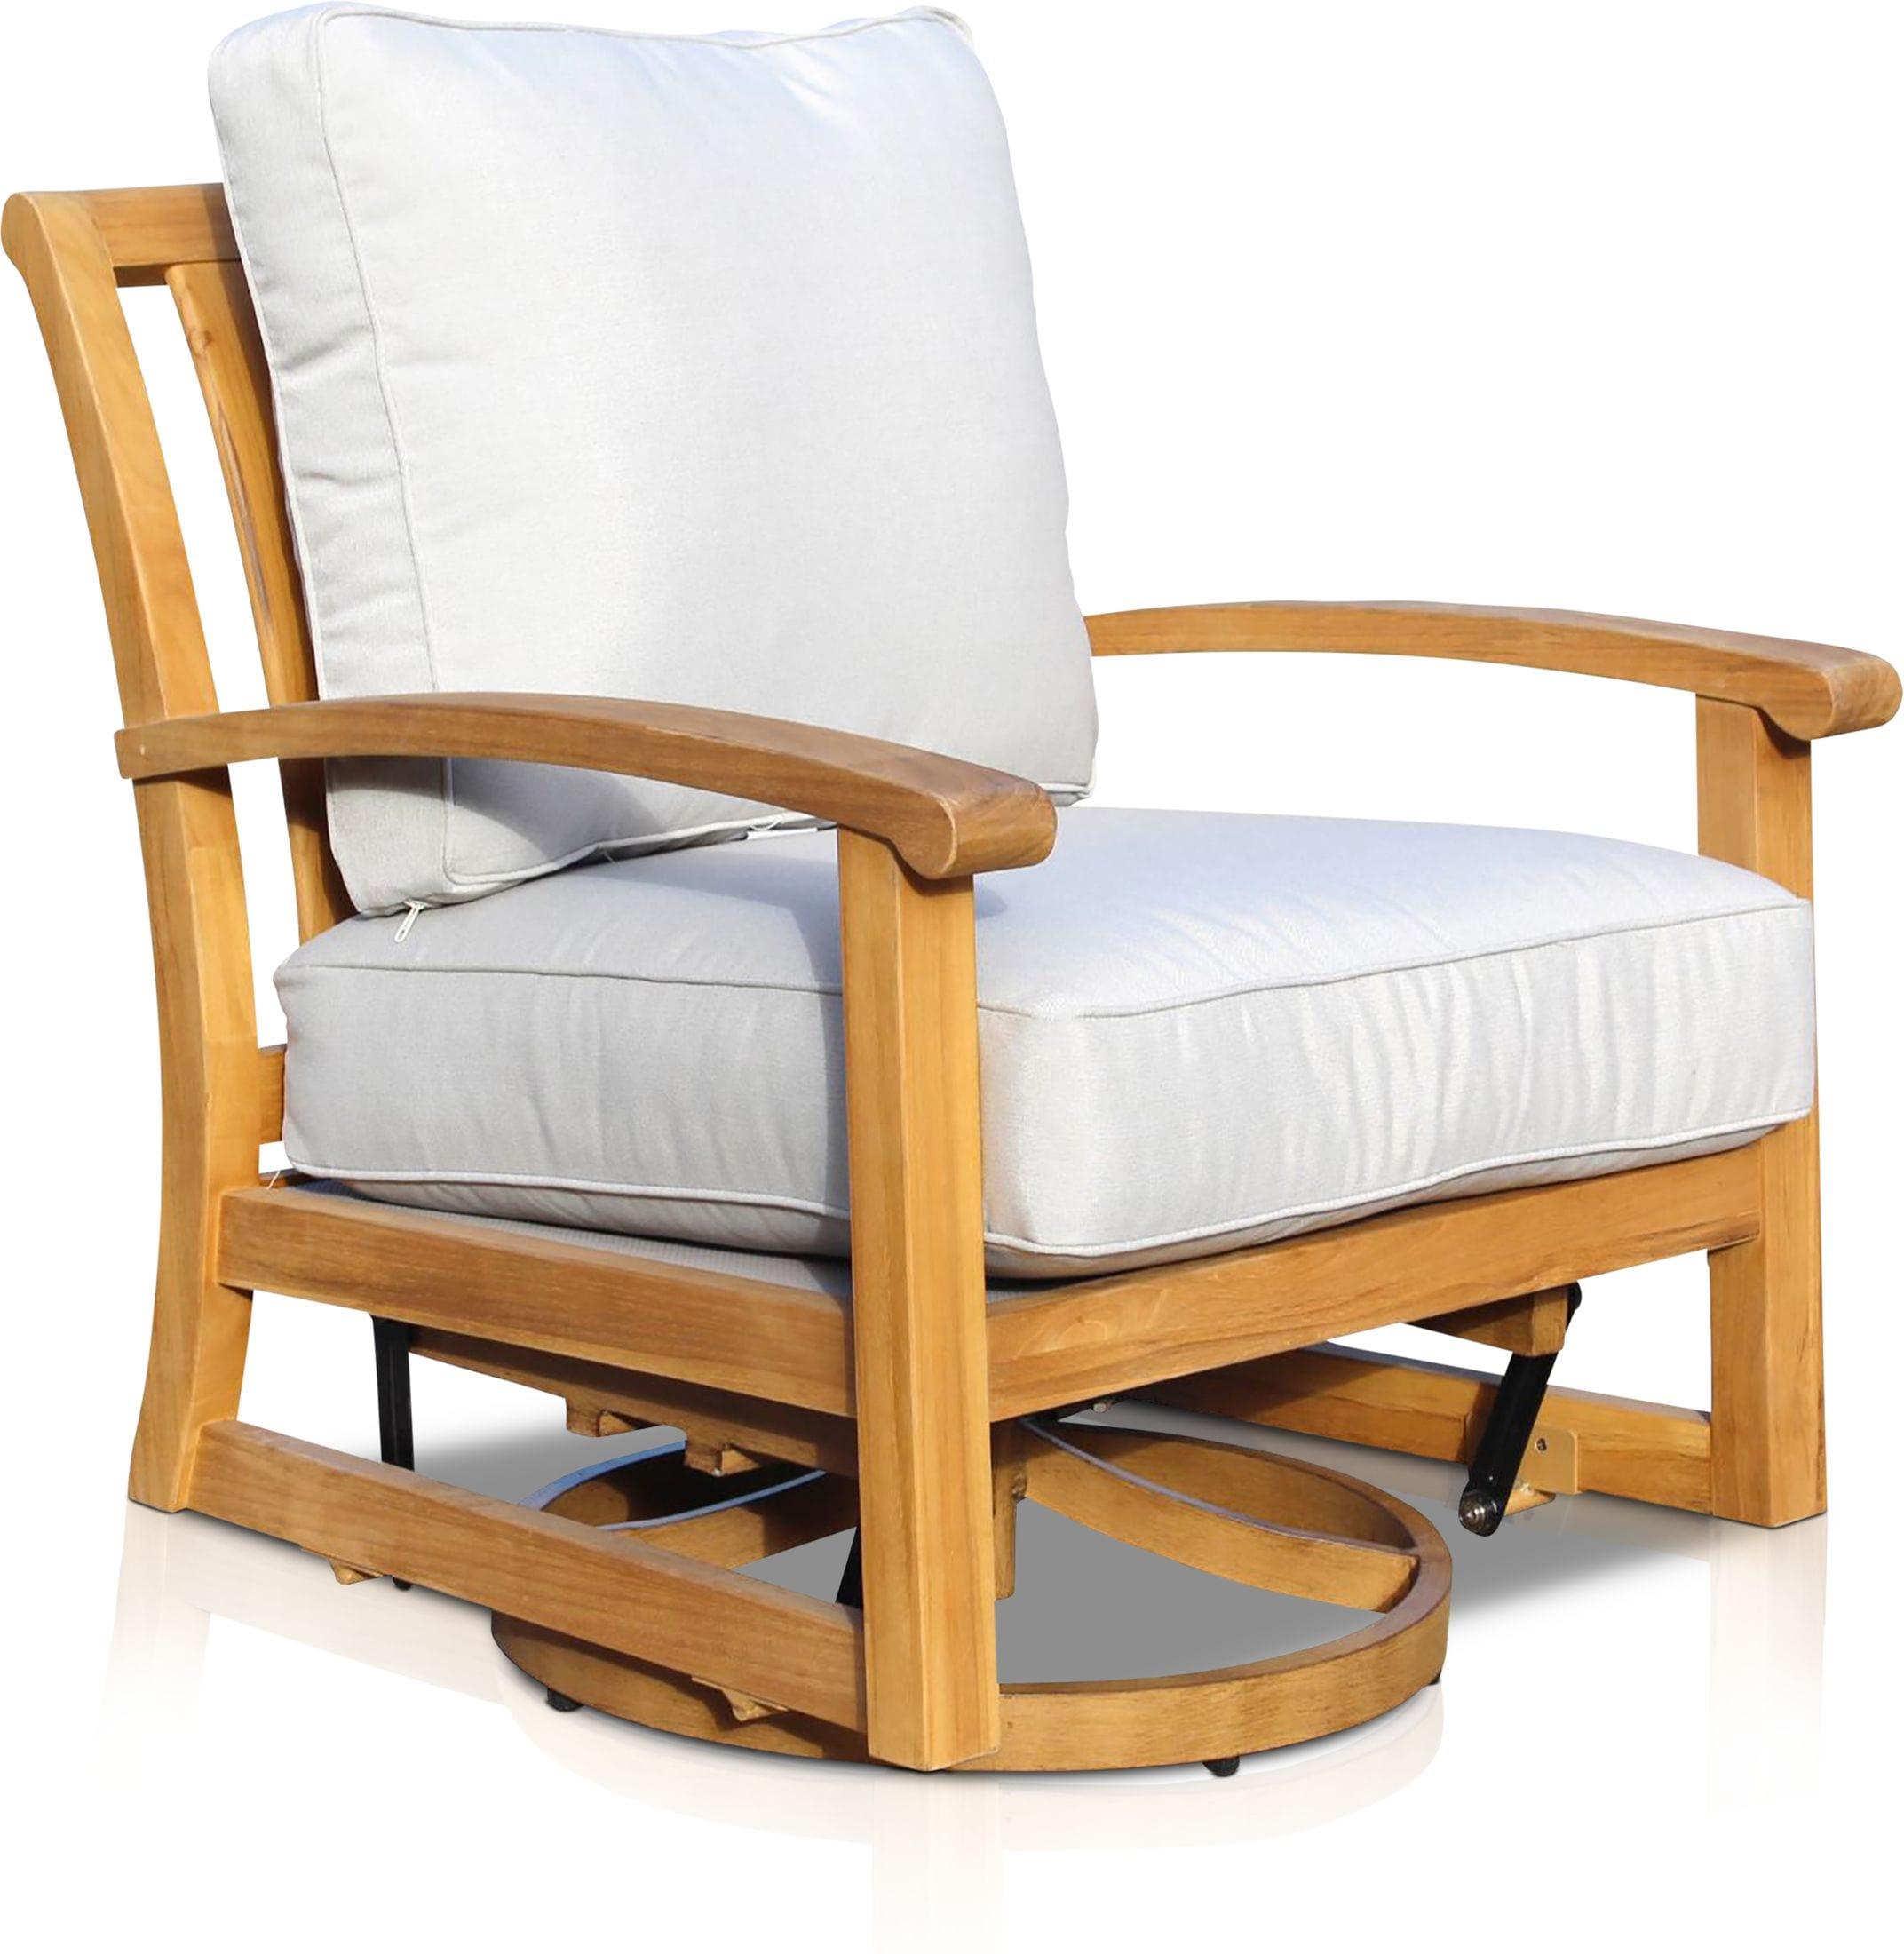 Outdoor Furniture - Bonita Outdoor Swivel Chair